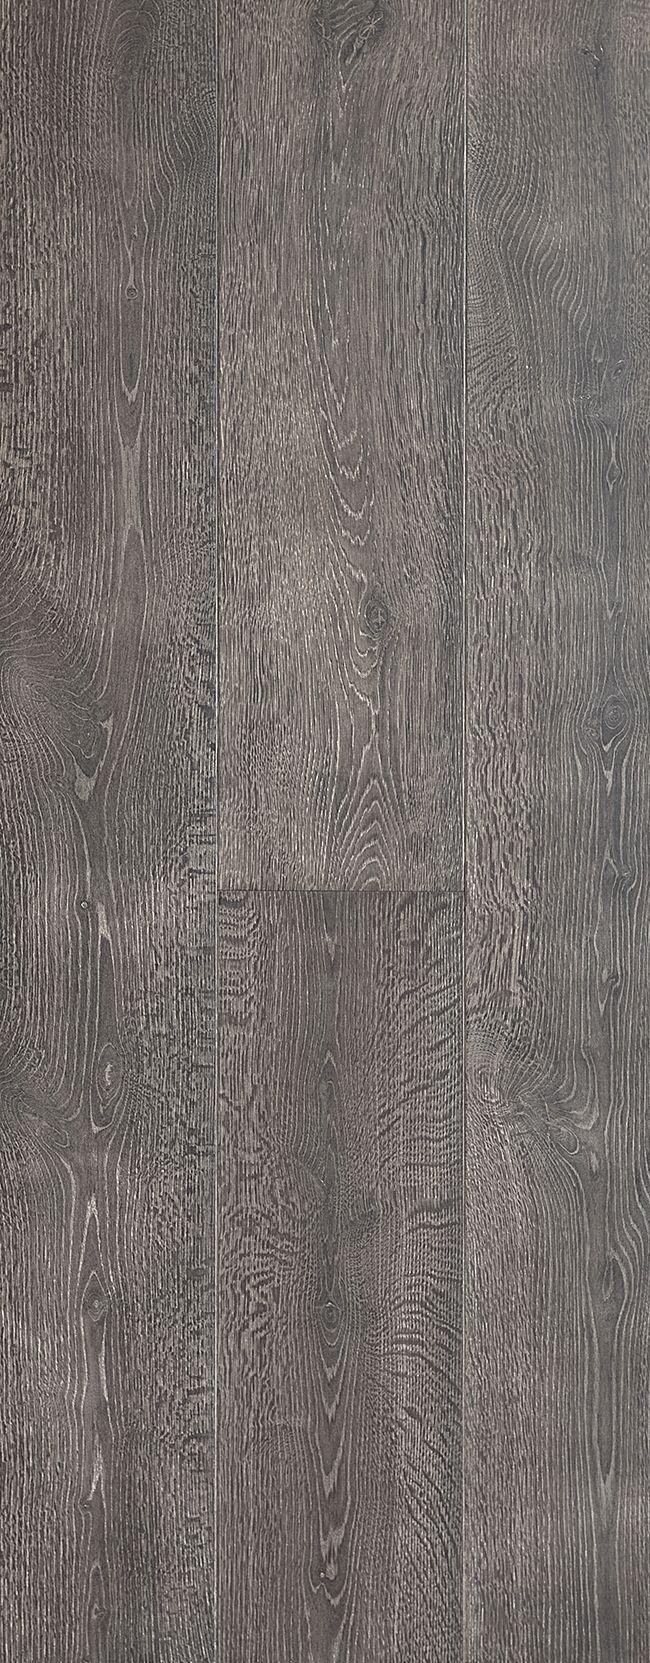 European White Oak -Character